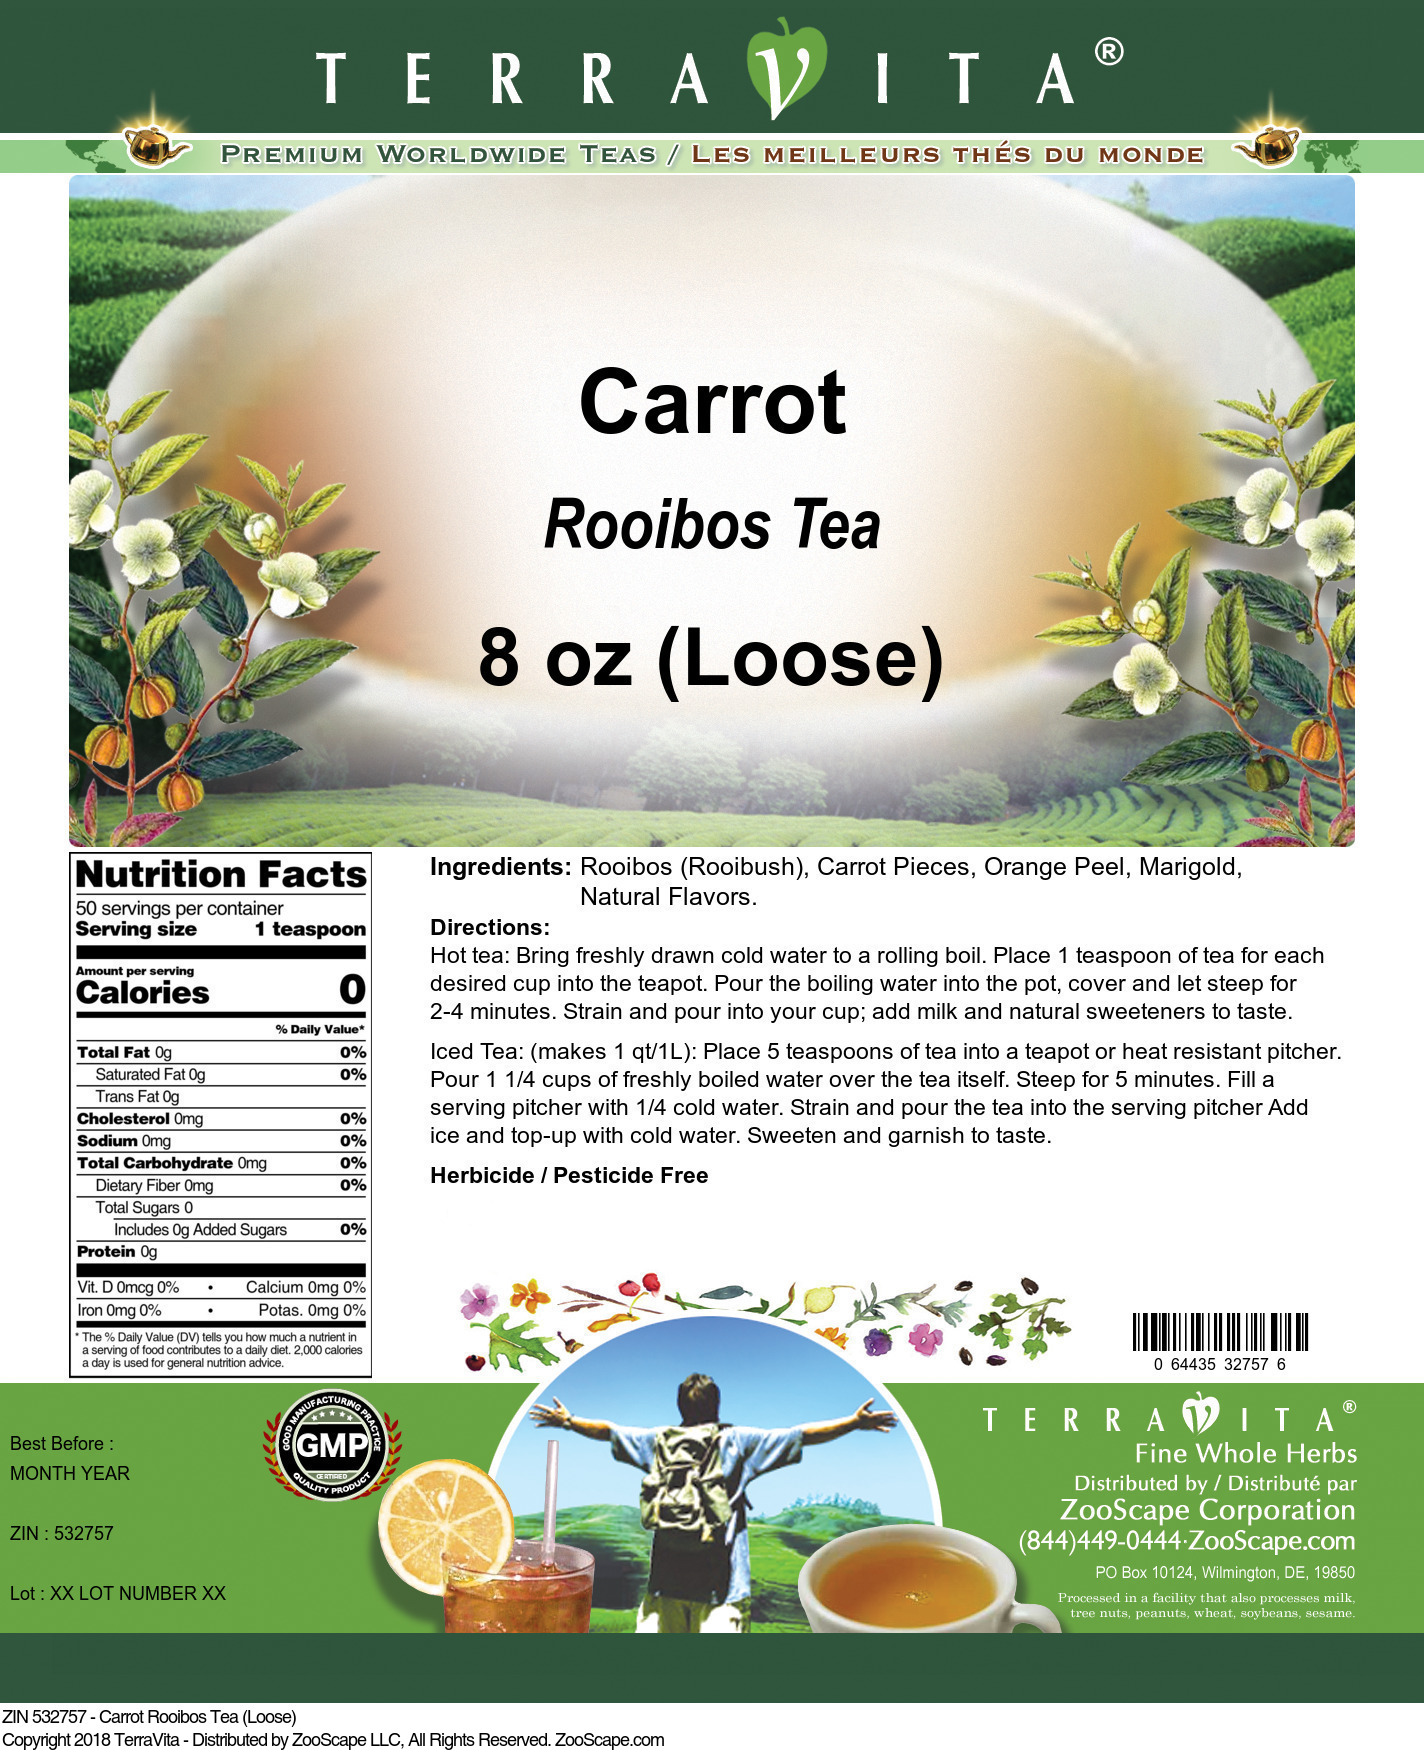 Carrot Rooibos Tea